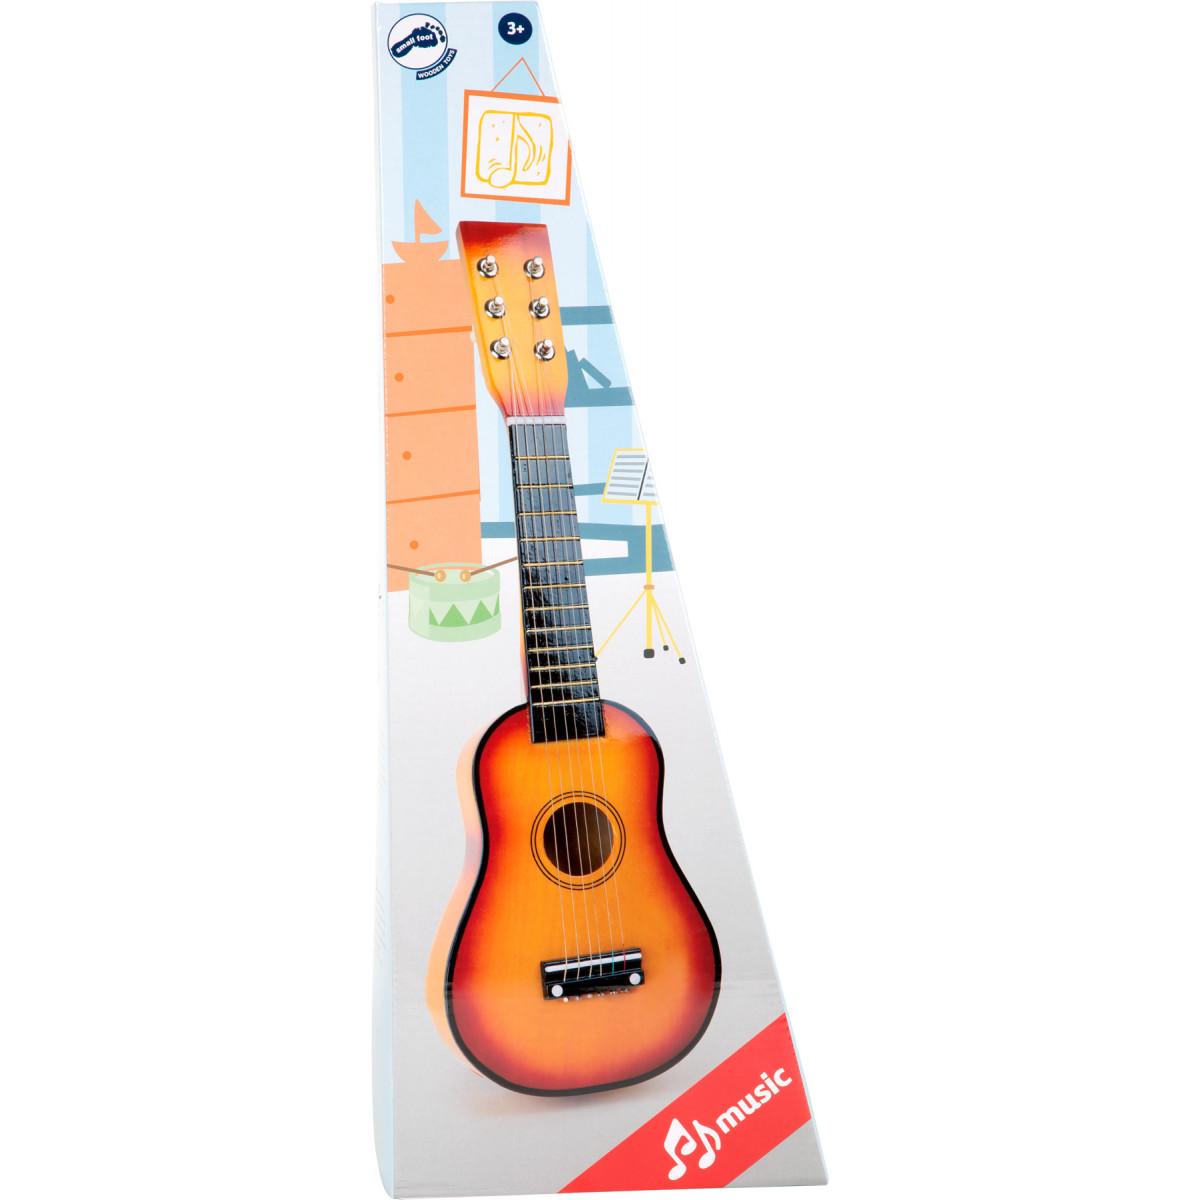 Guitare jouet Sunburst